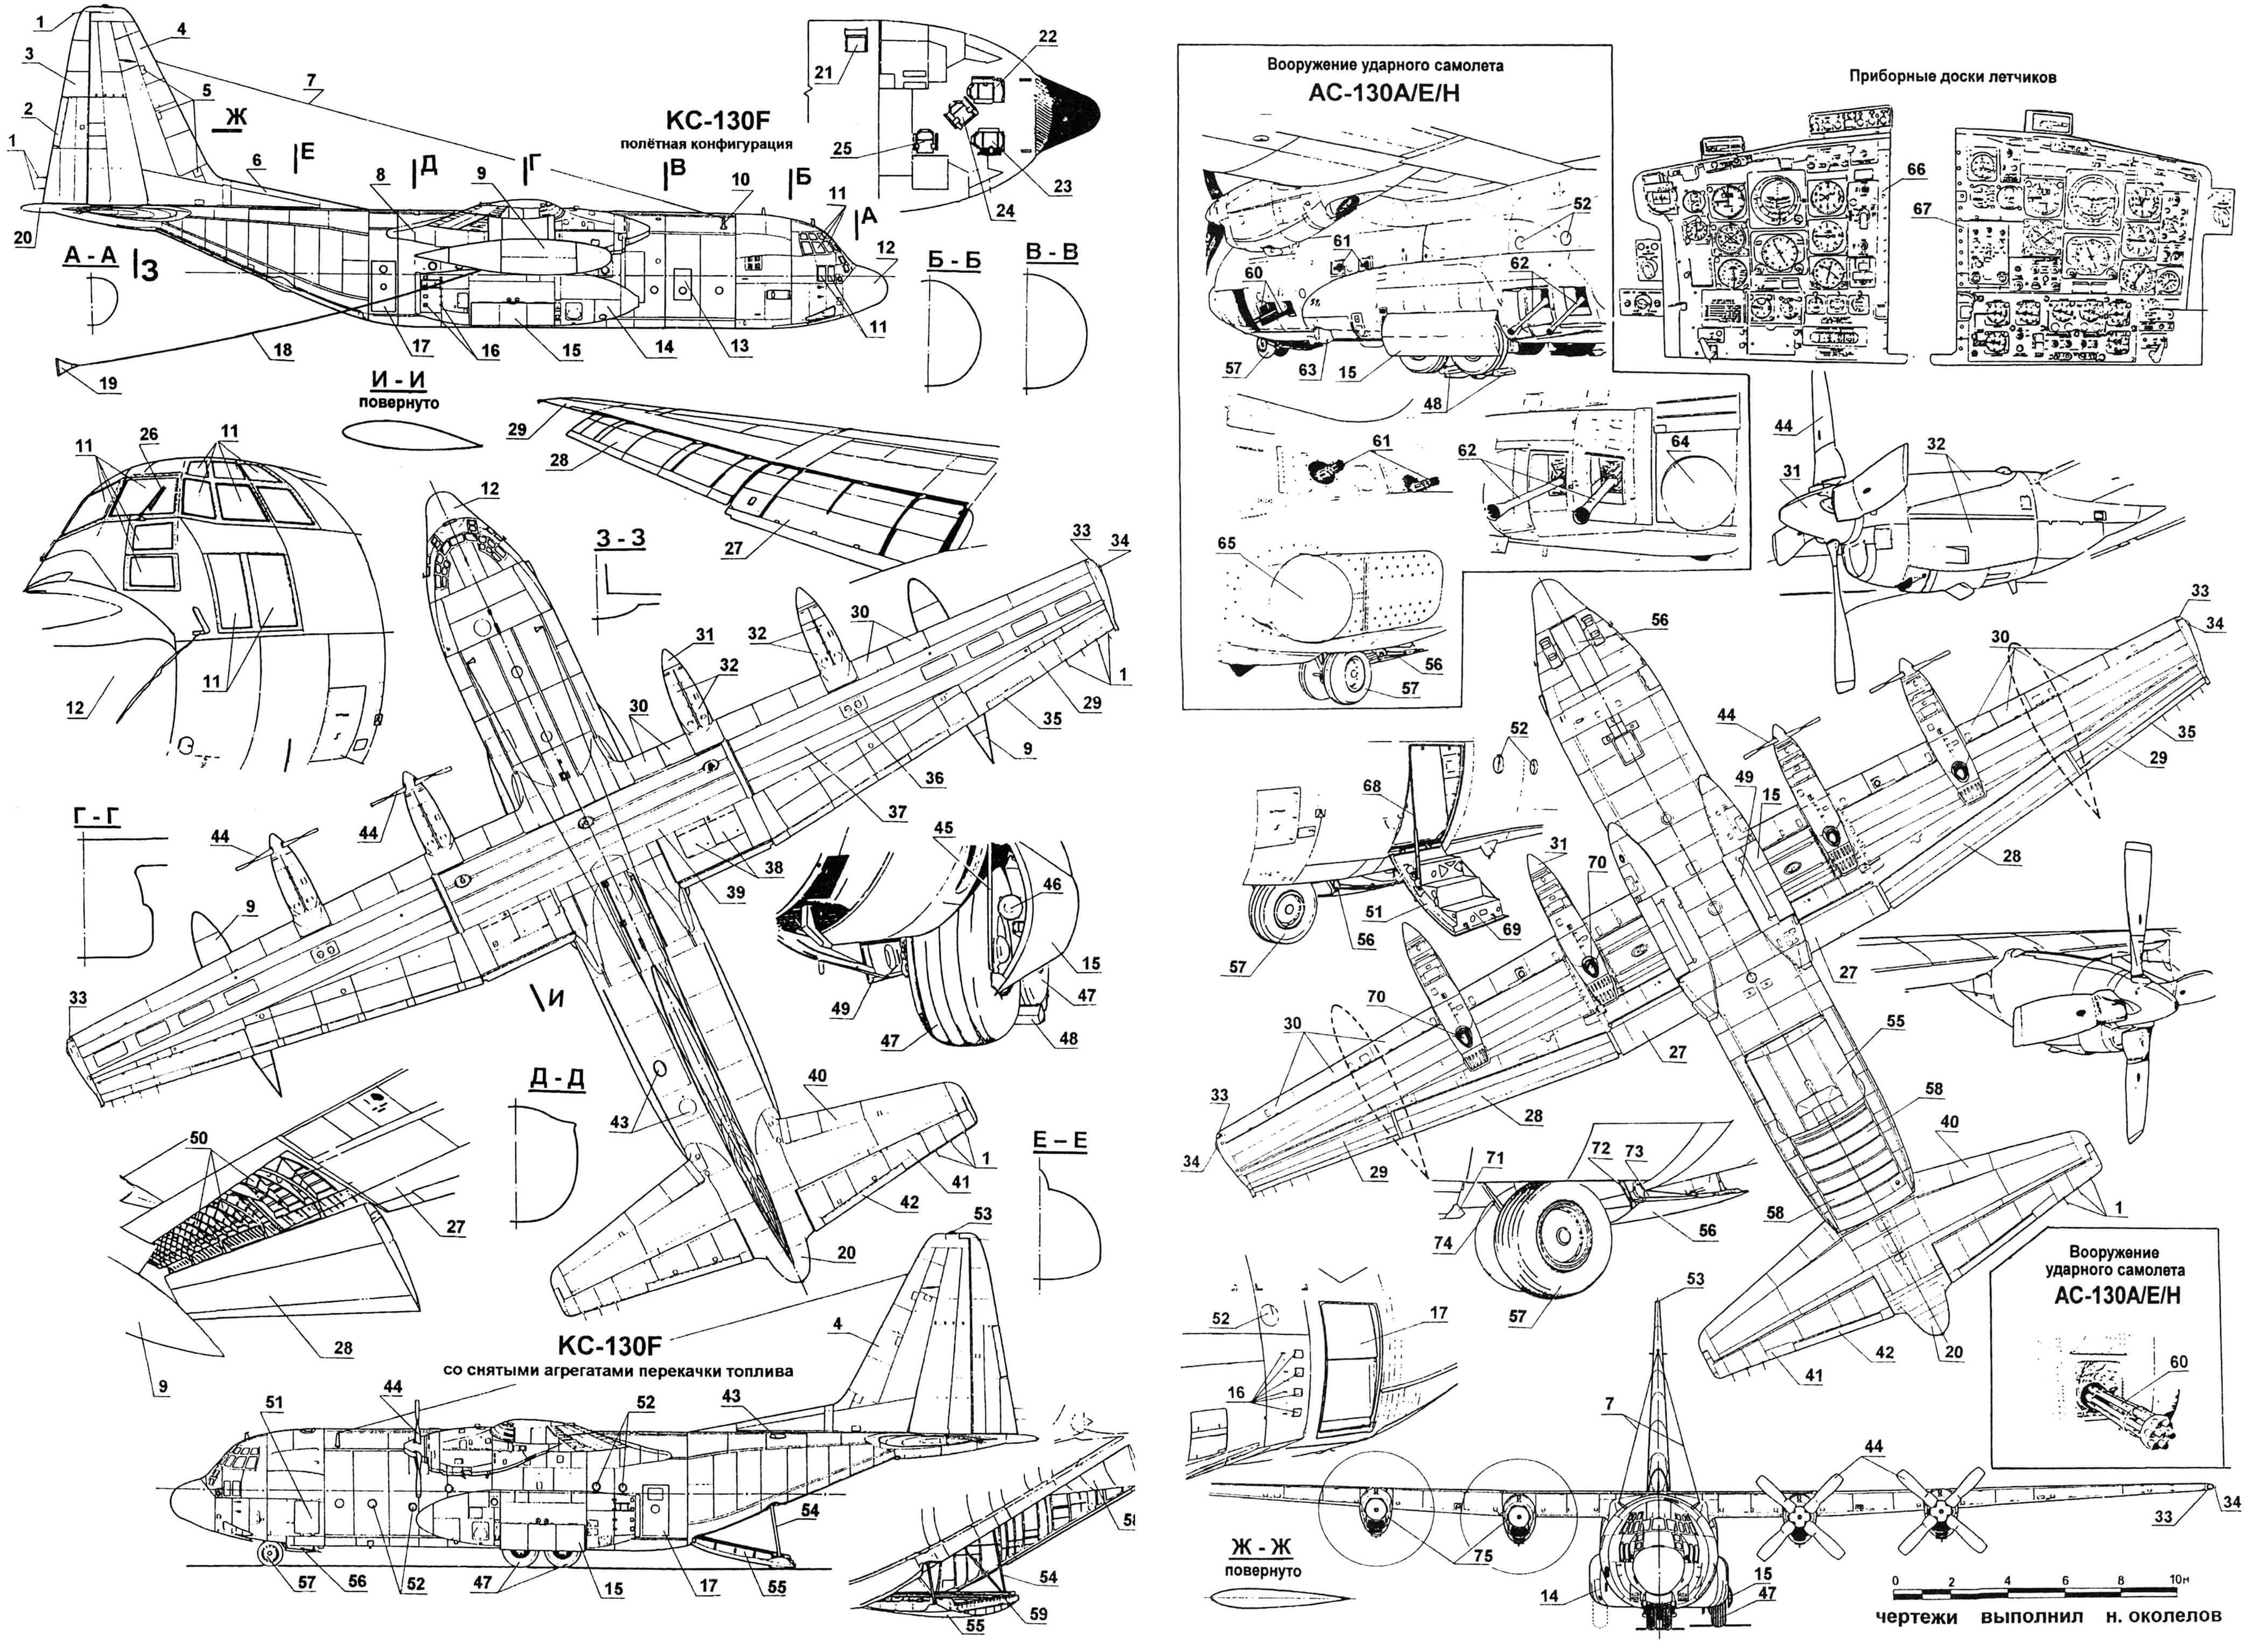 Самолет KC-130F Hercules